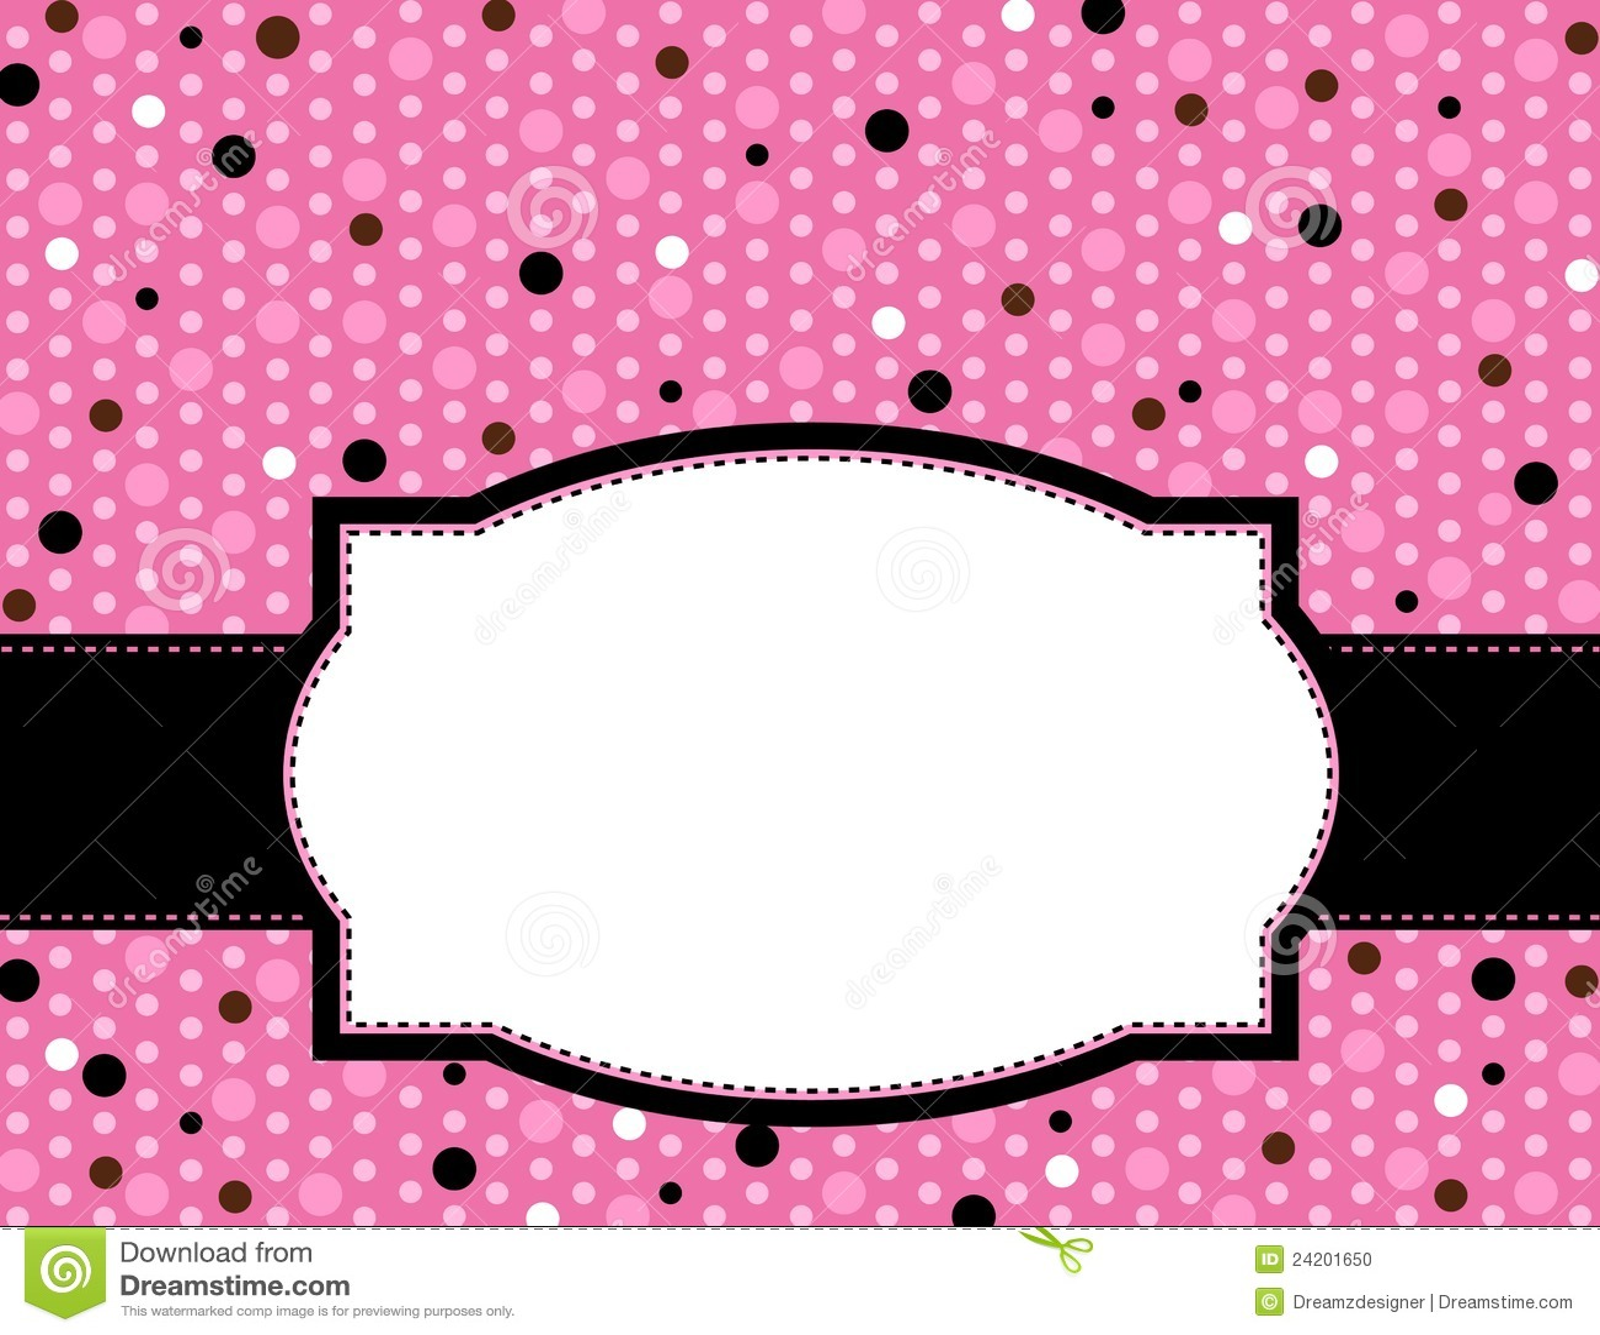 Polka Frame Background Stock Vector Illustration Of Brochure 24201650